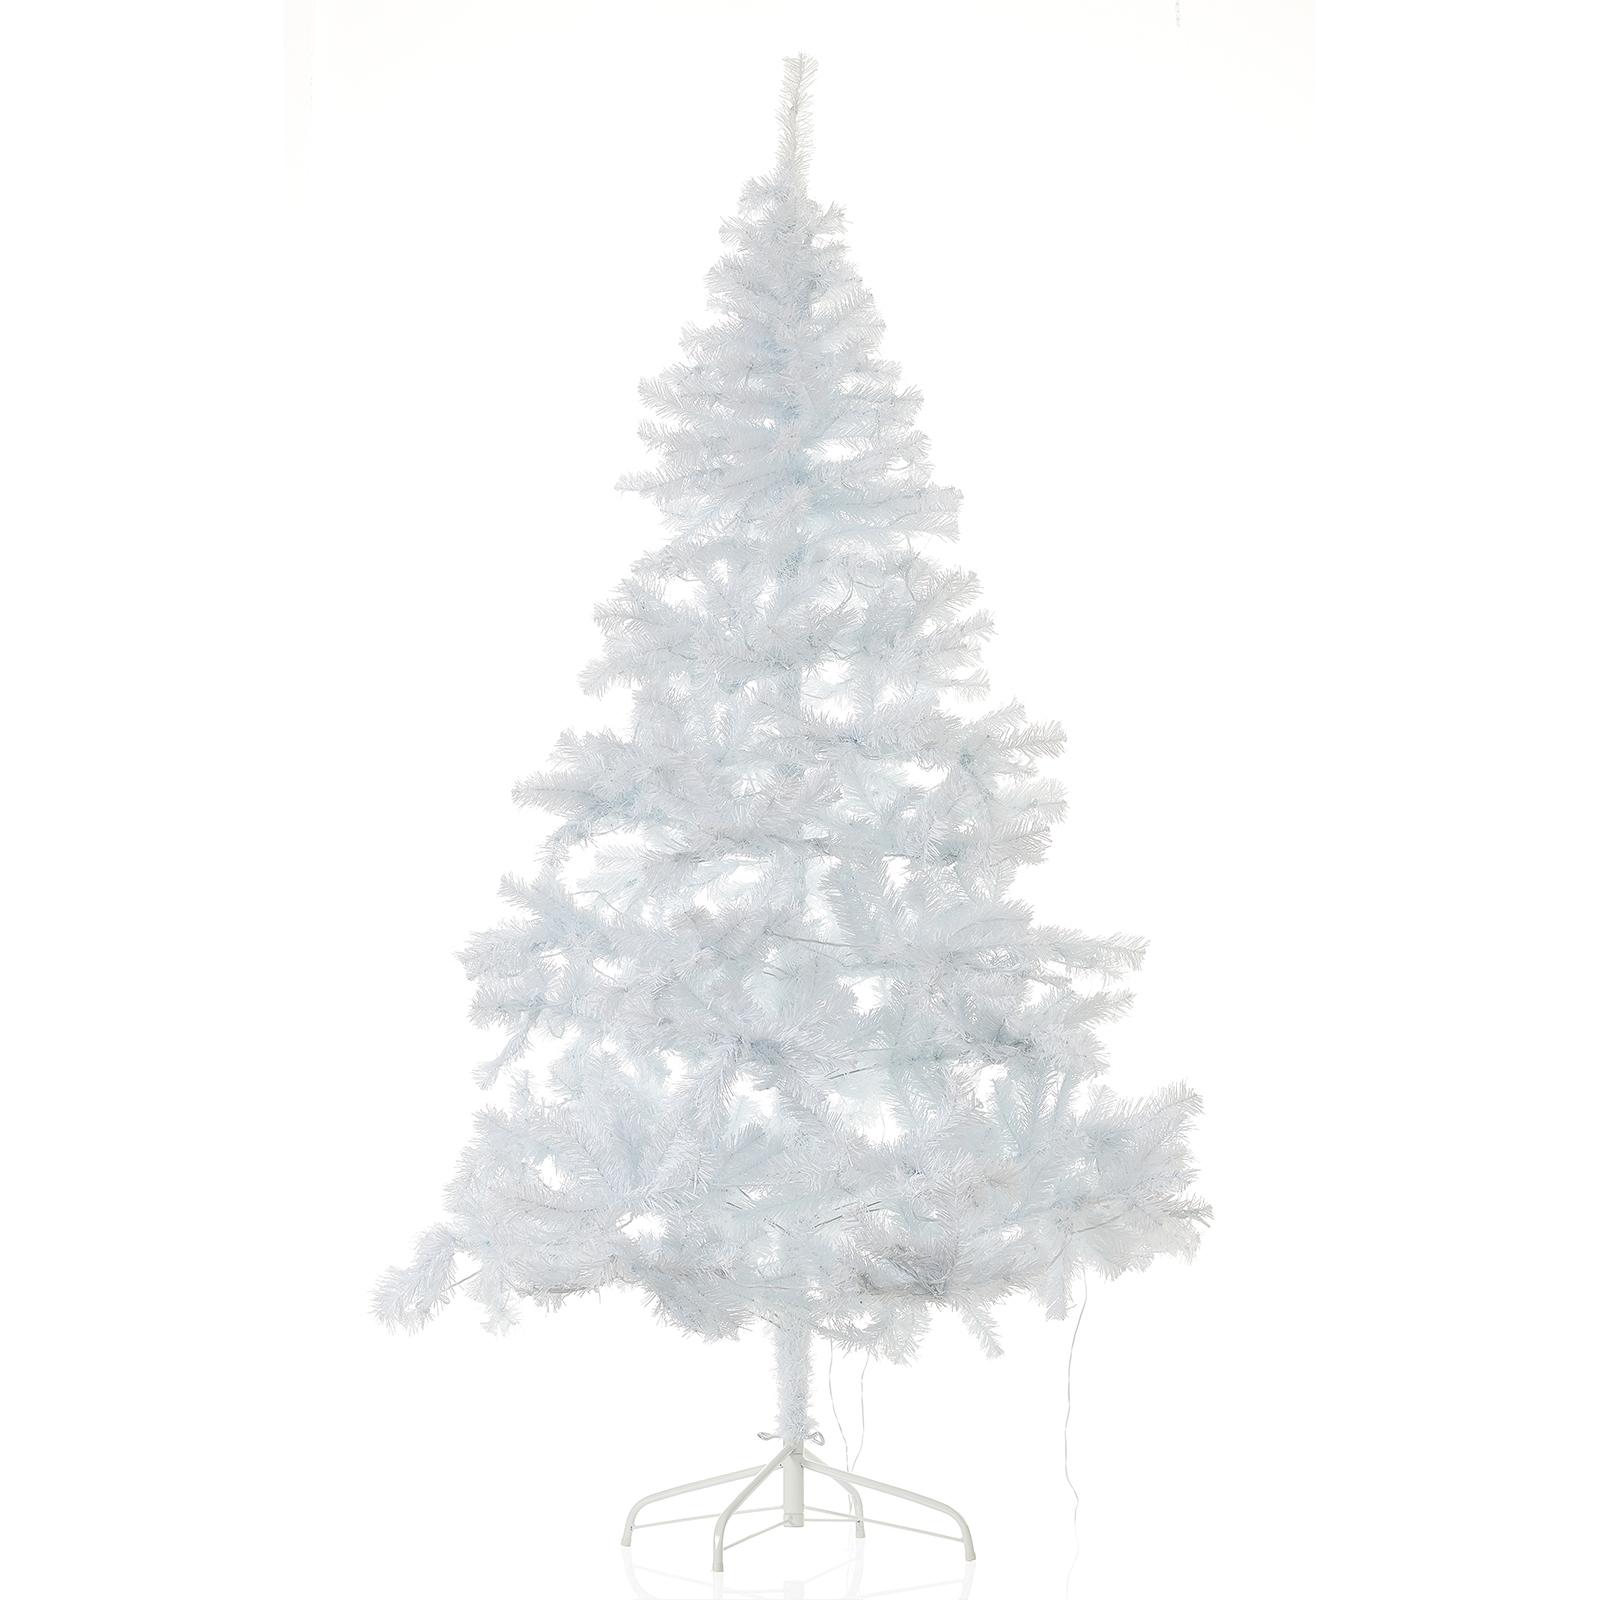 LED vianočný stromček Ottawa, 2,1 m 260 LED_1522181_1